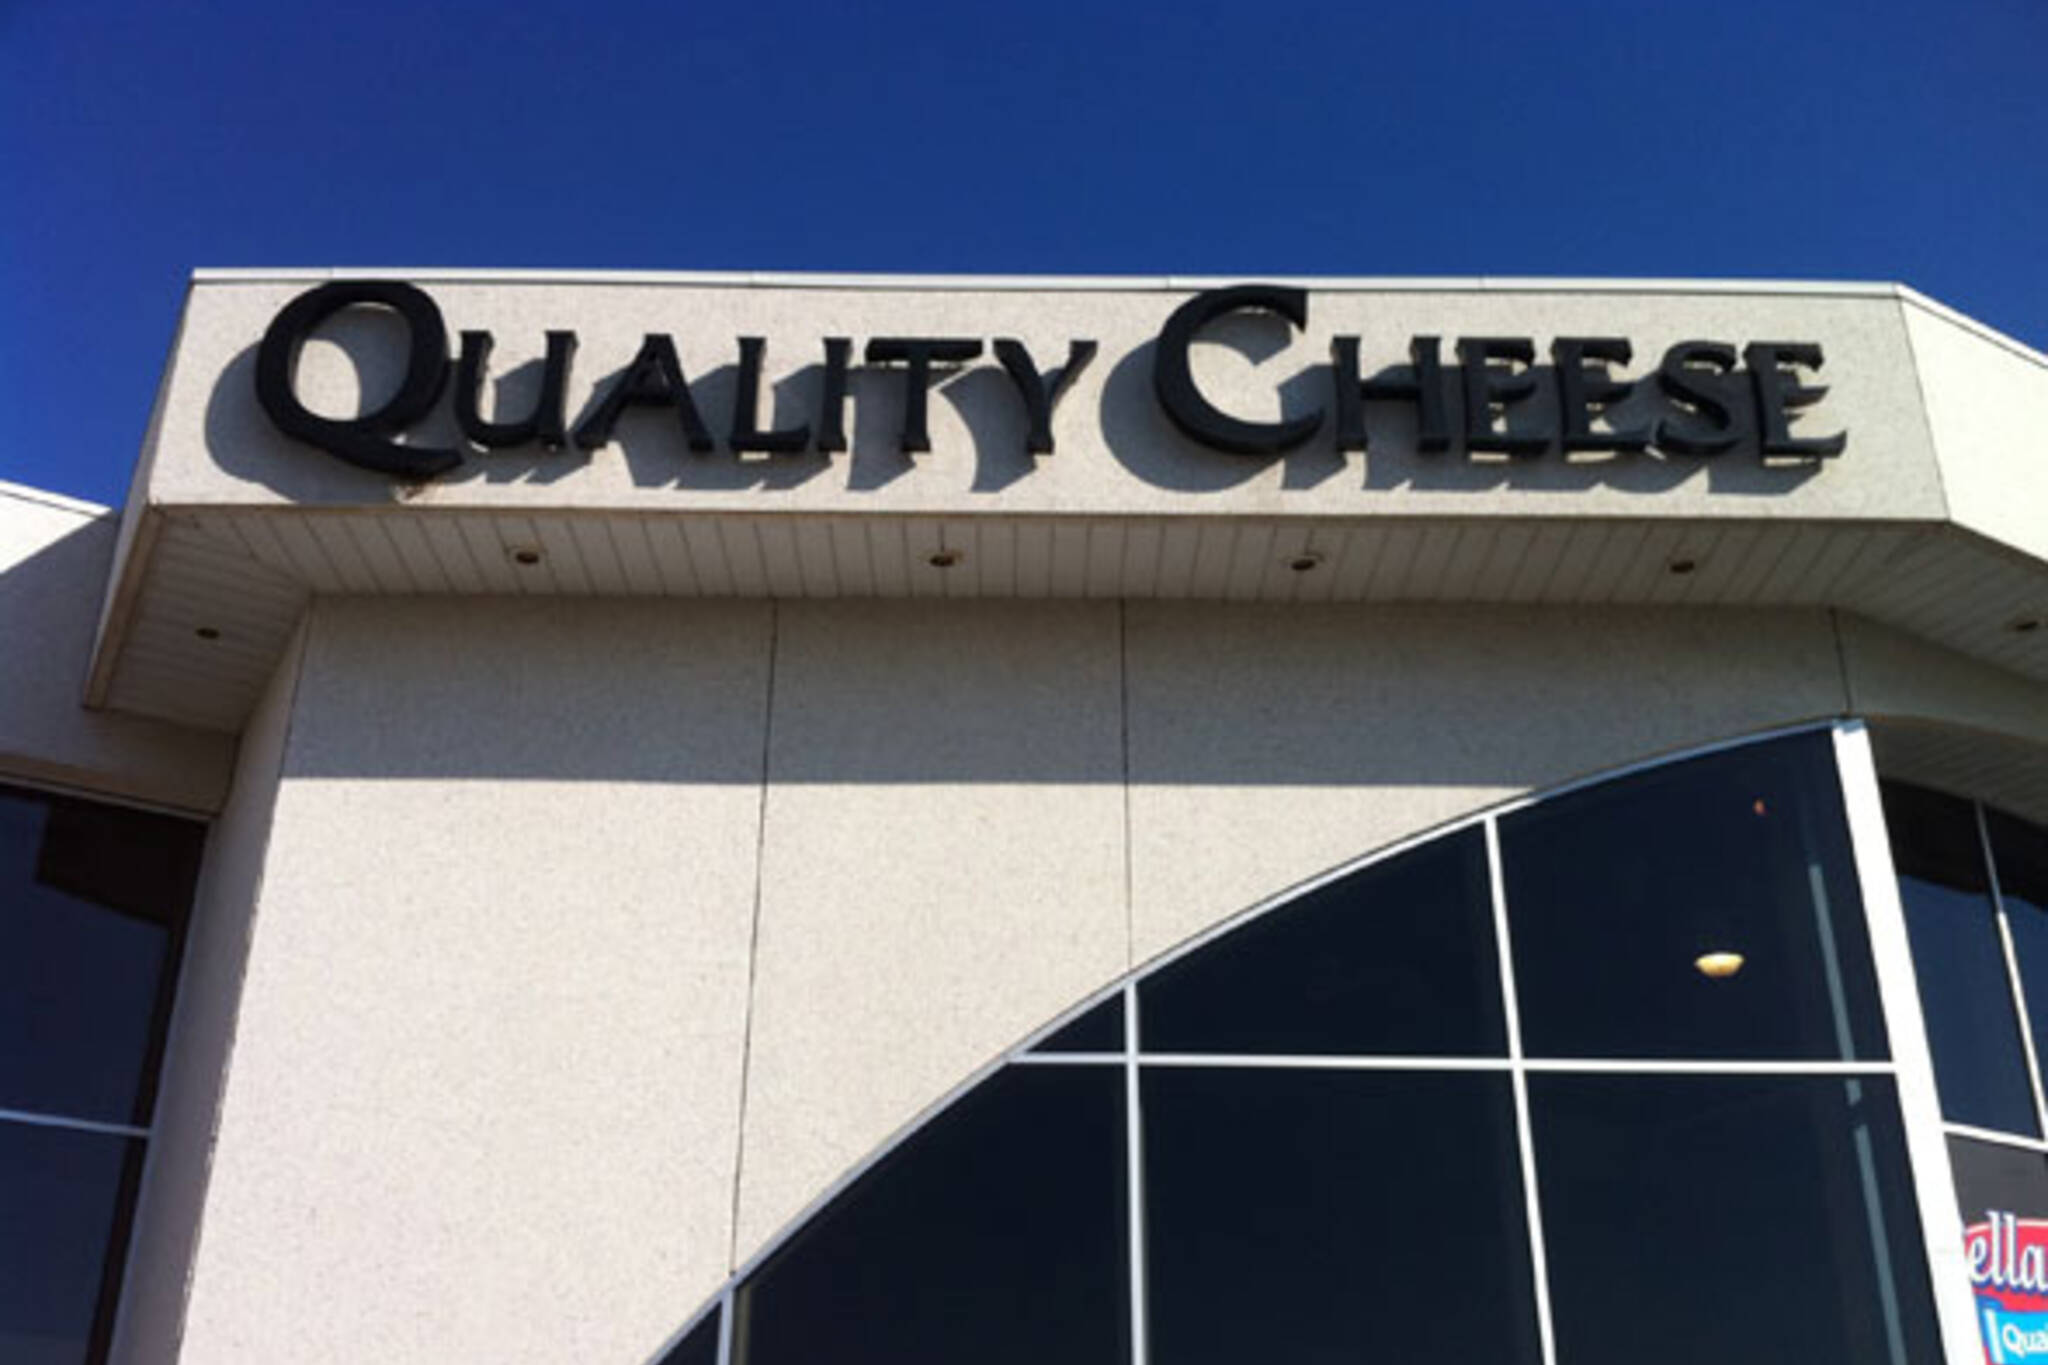 Quality Cheese Woodbridge